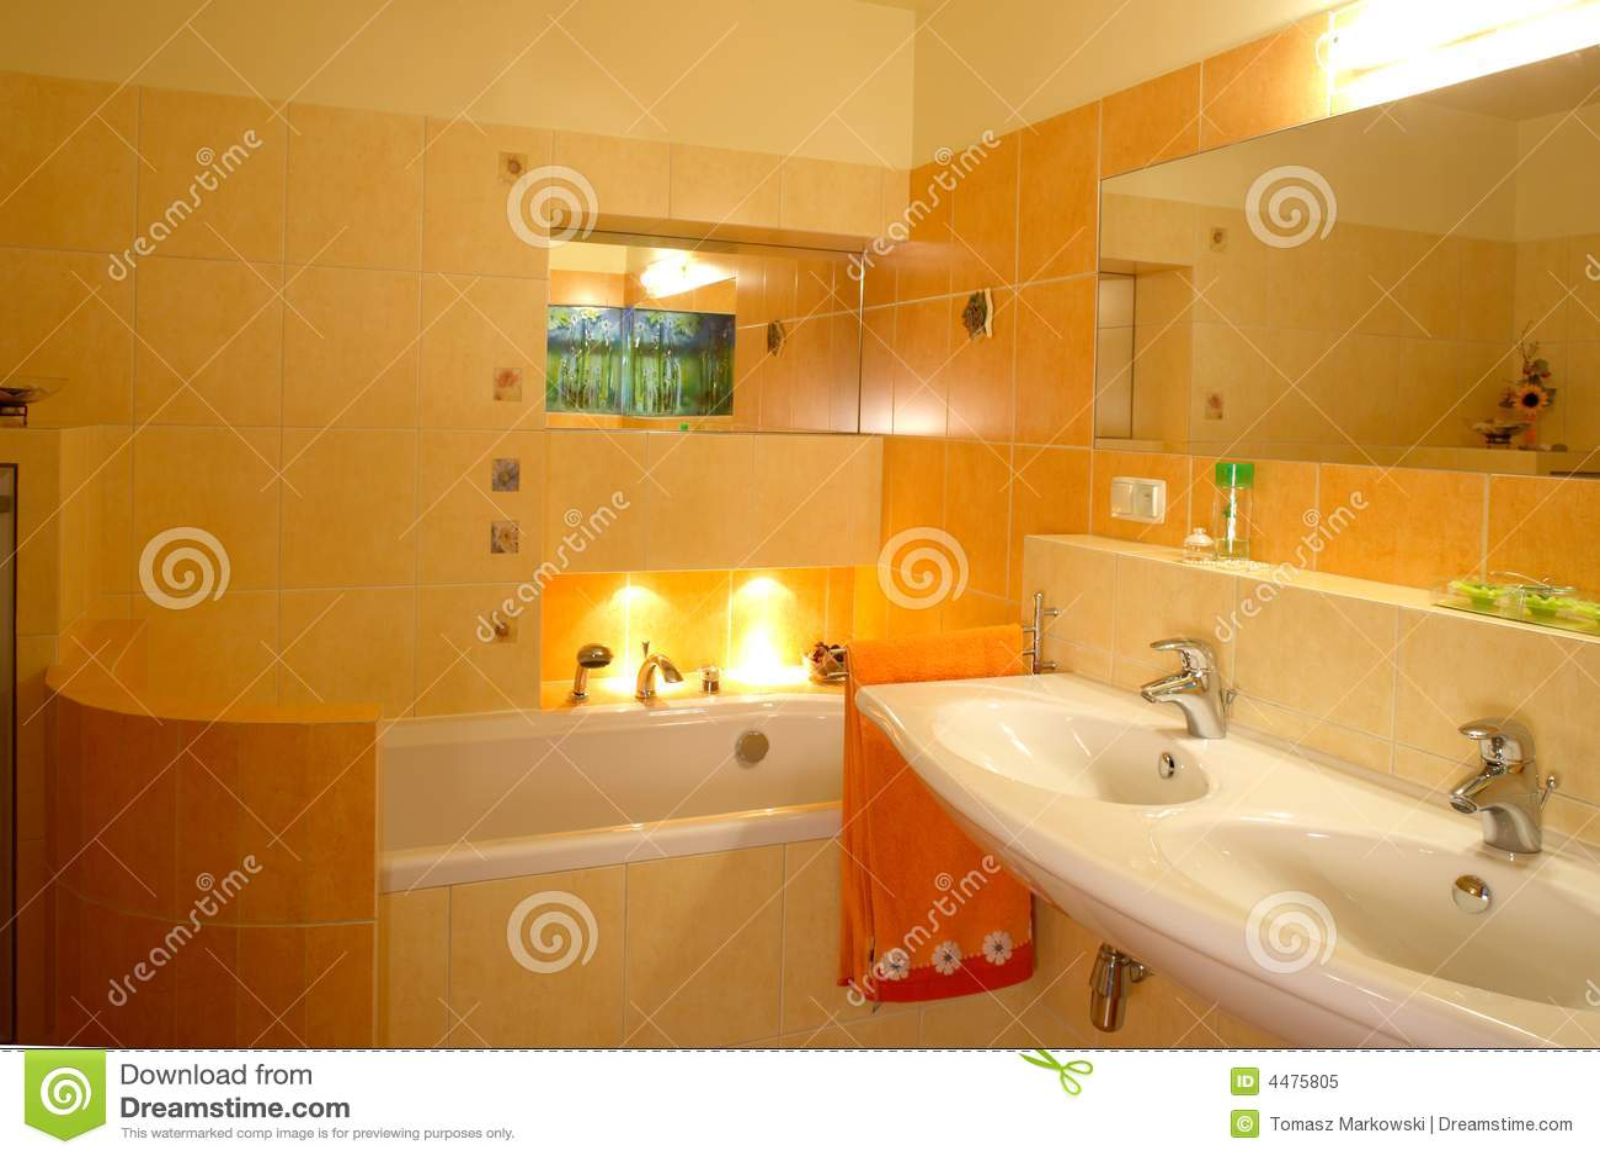 orange bathroom interior royalty free stock photo - image: 4475805